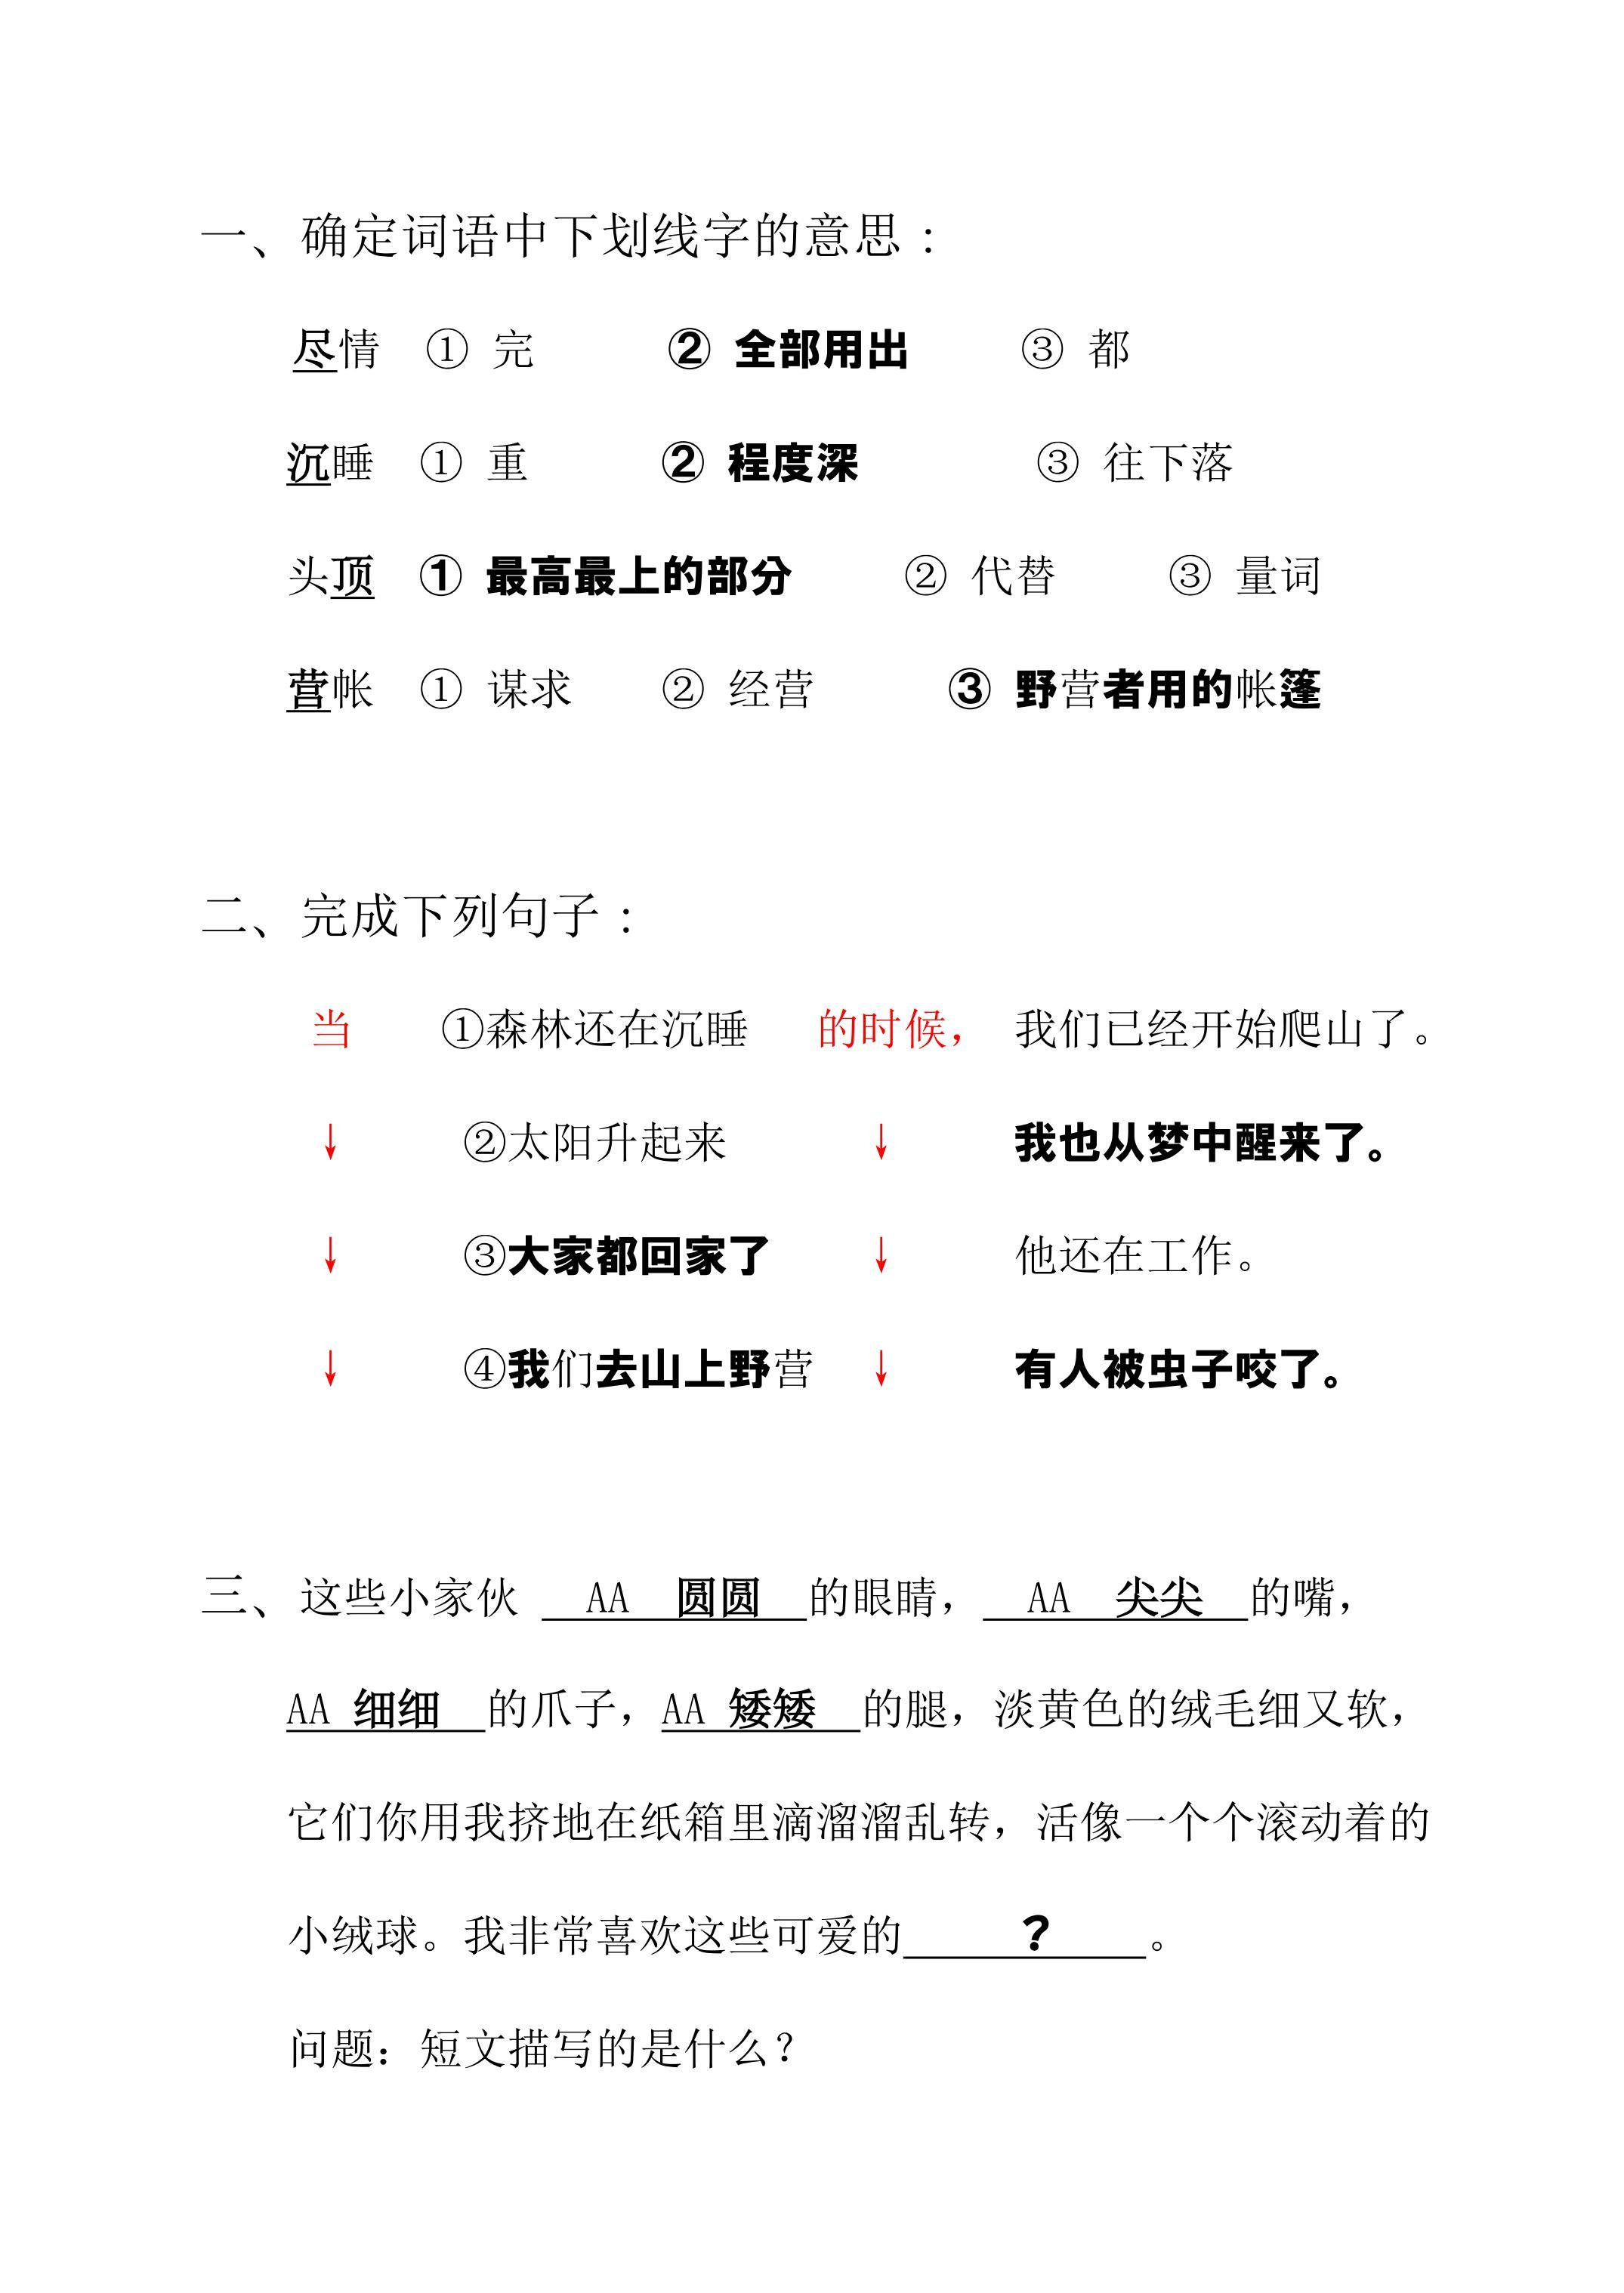 答案 : 中国語の部屋